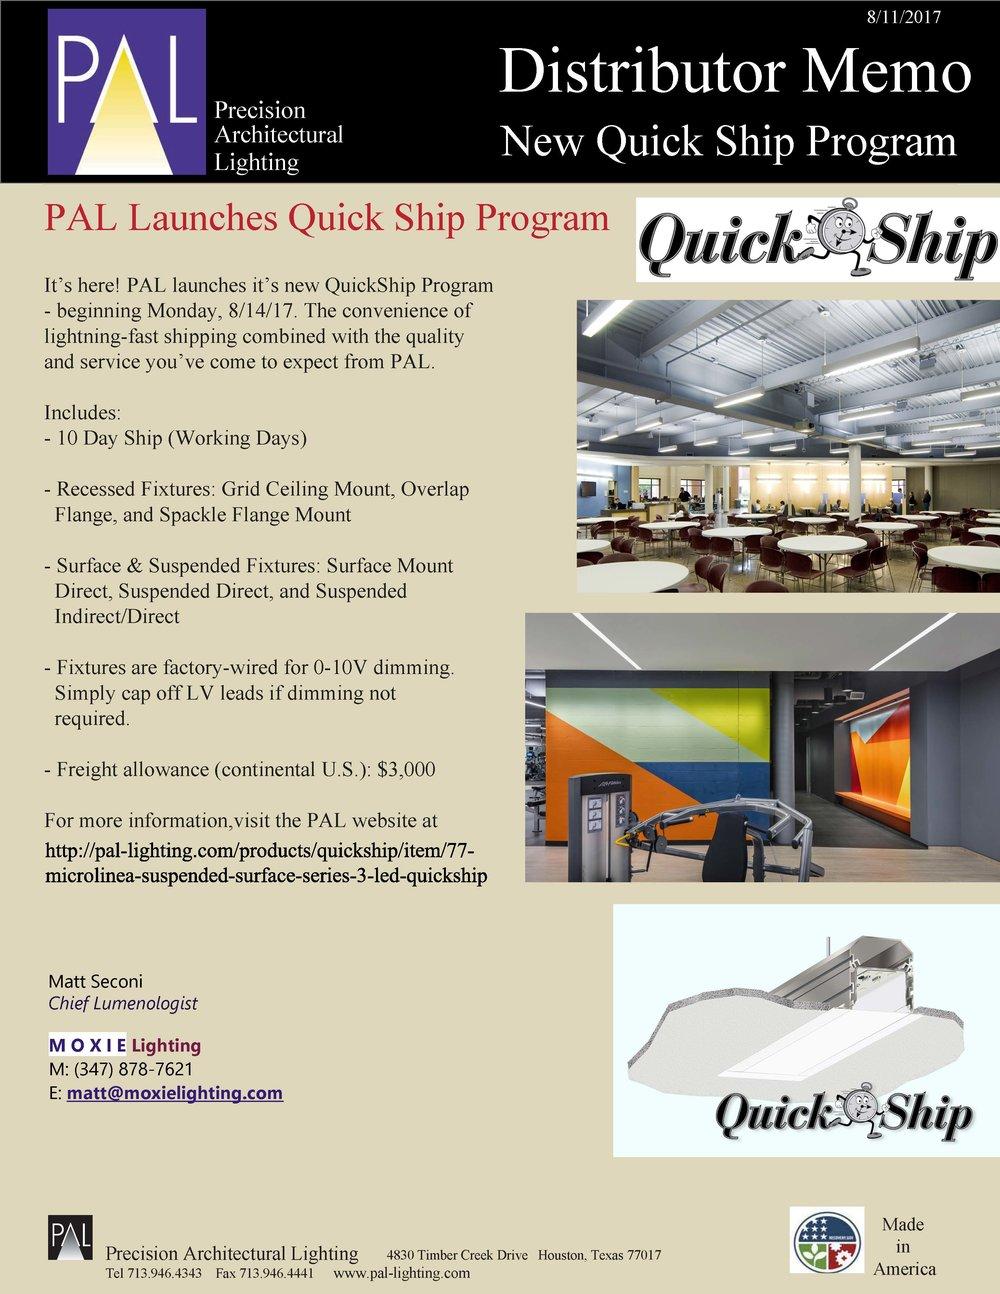 Quick Ship Program Memo - Matt Seconi.jpg